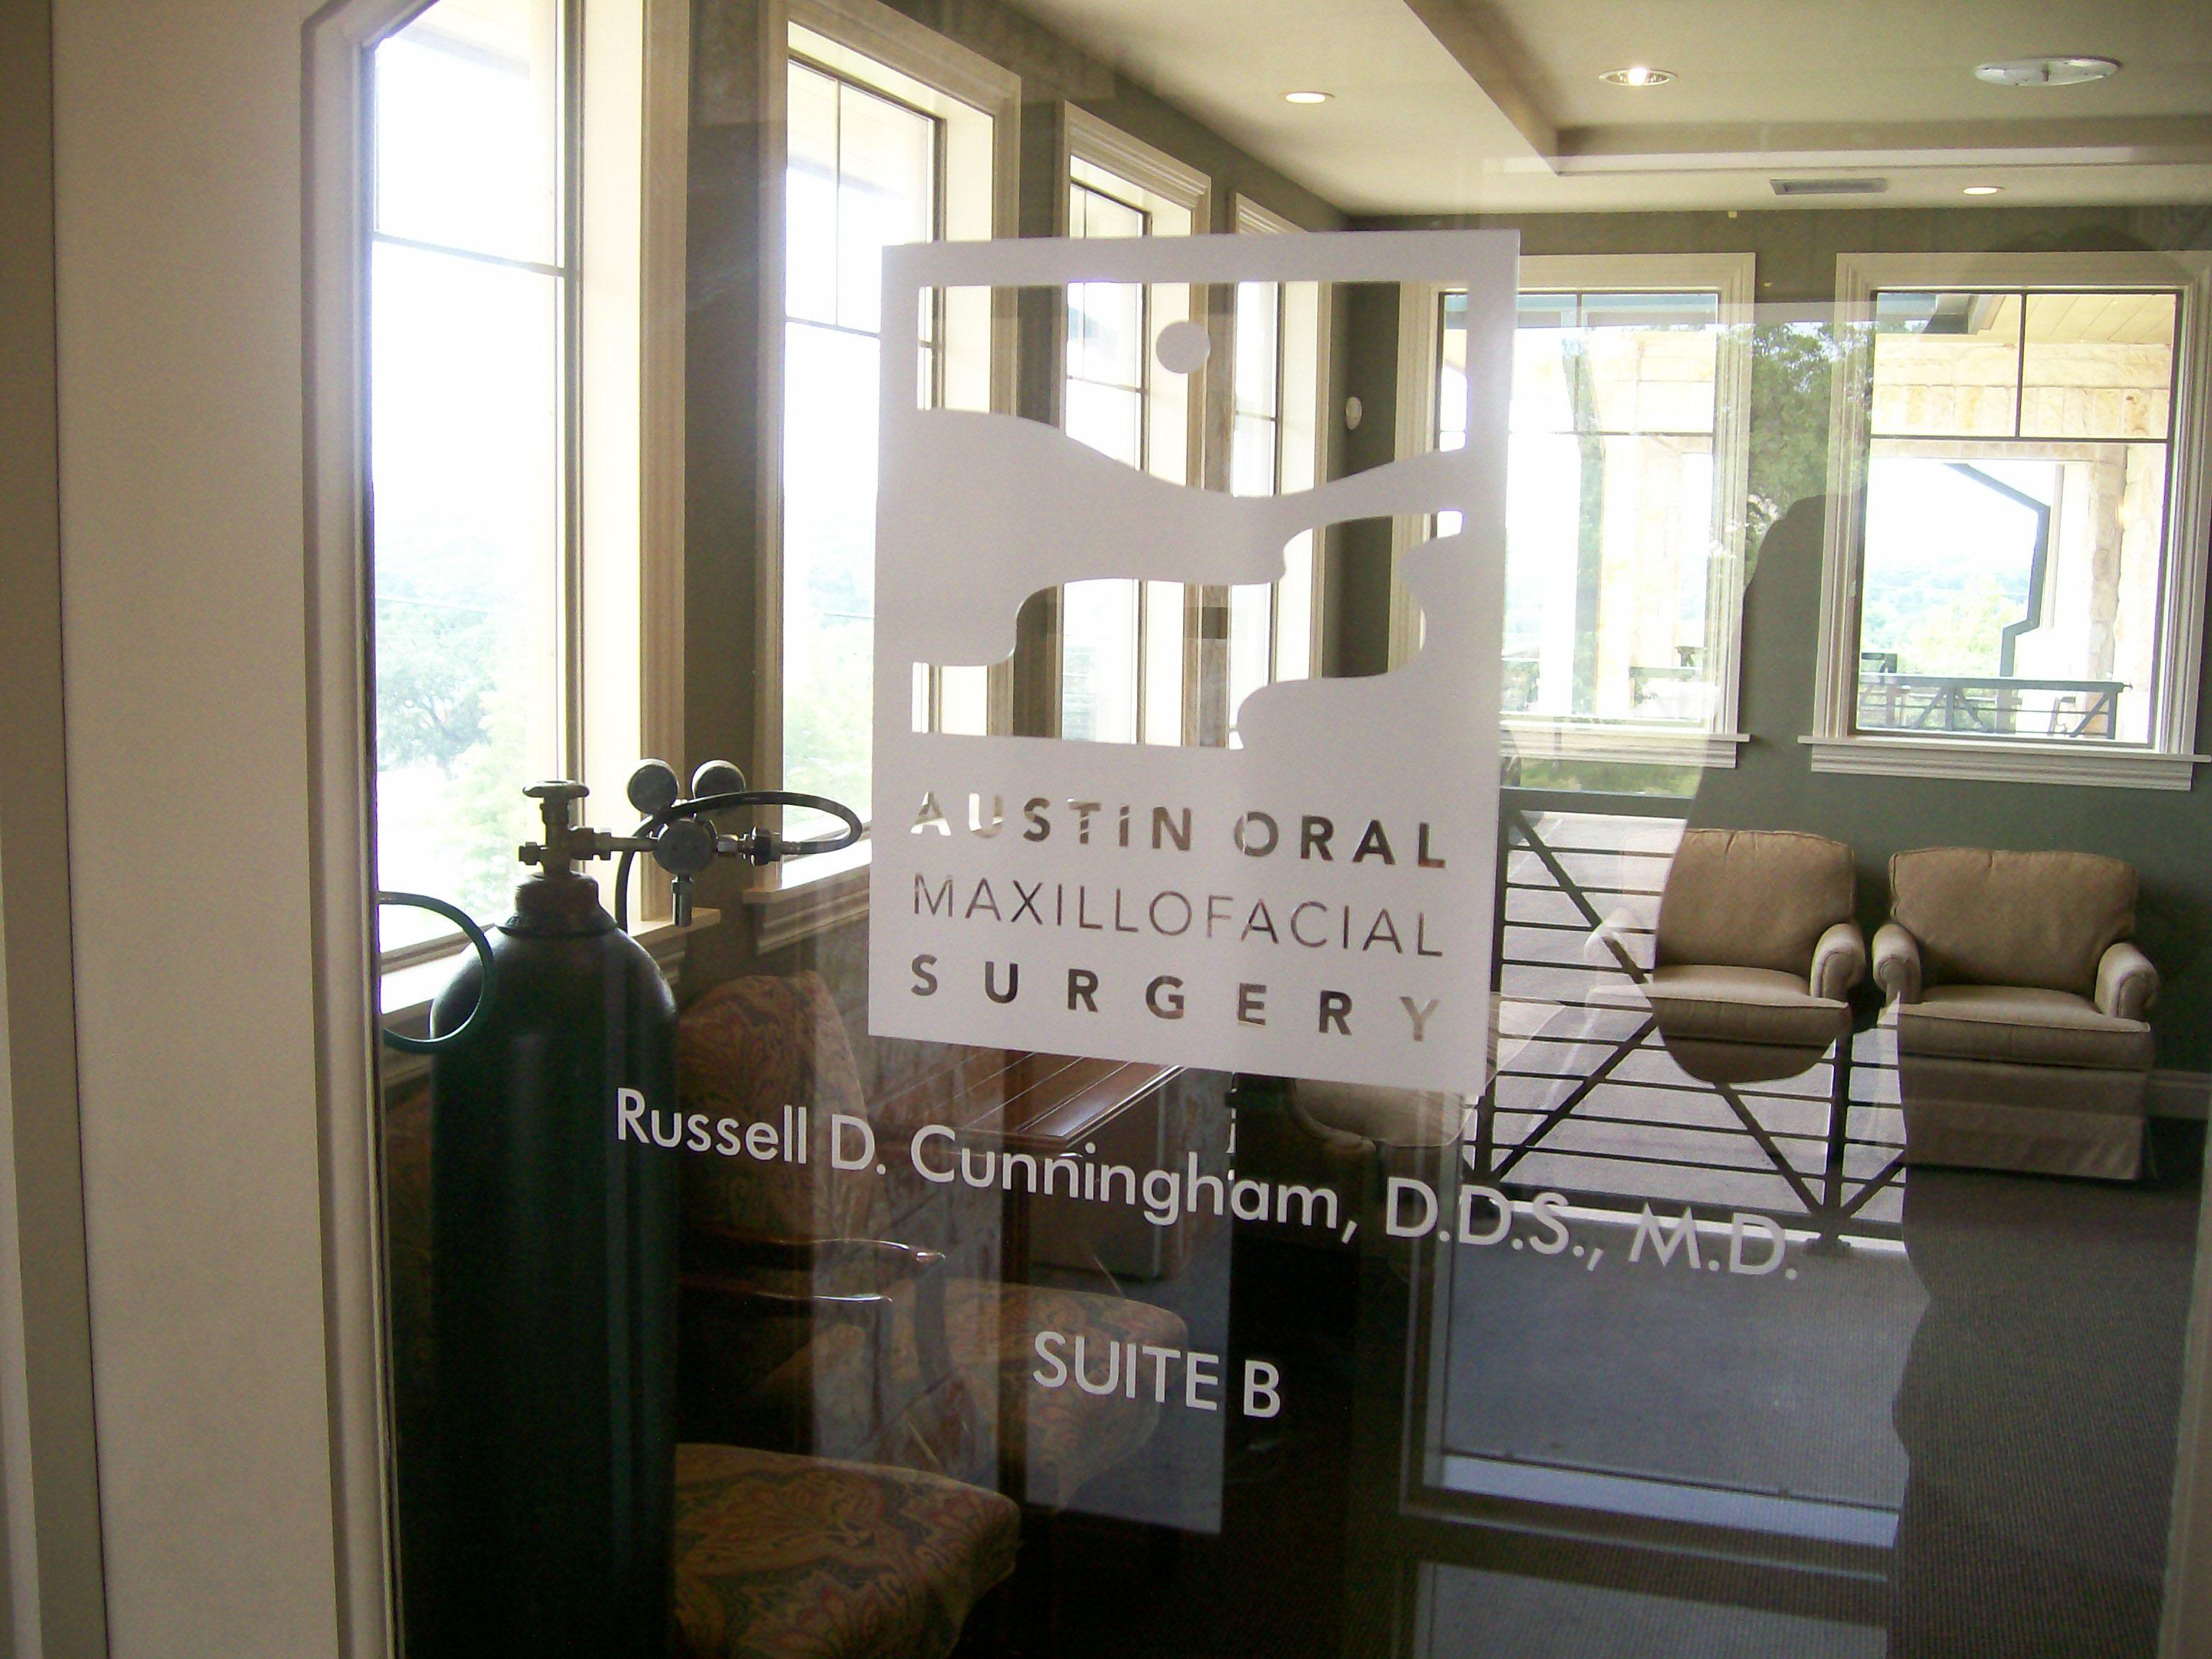 Austin Oral Surgery - lk15119 - 2.jpg